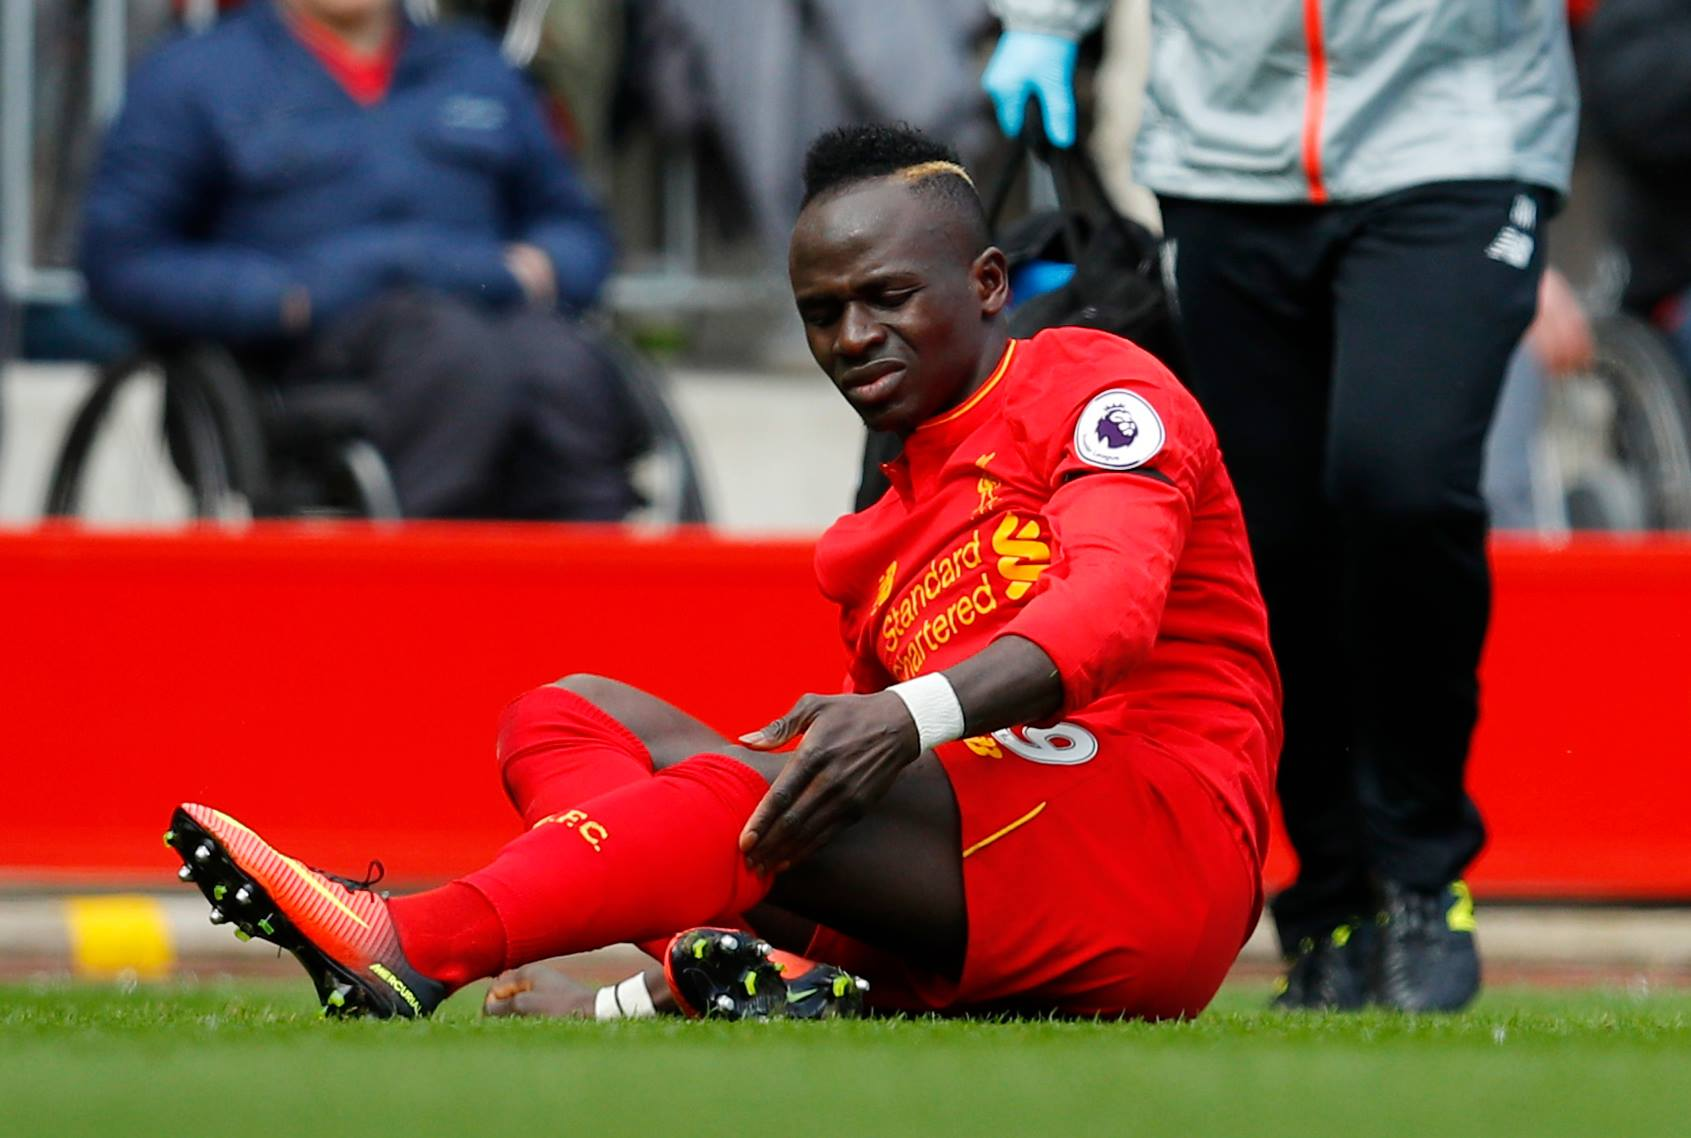 Liverpool : Sadio Mané va subir une intervention chirurgicale